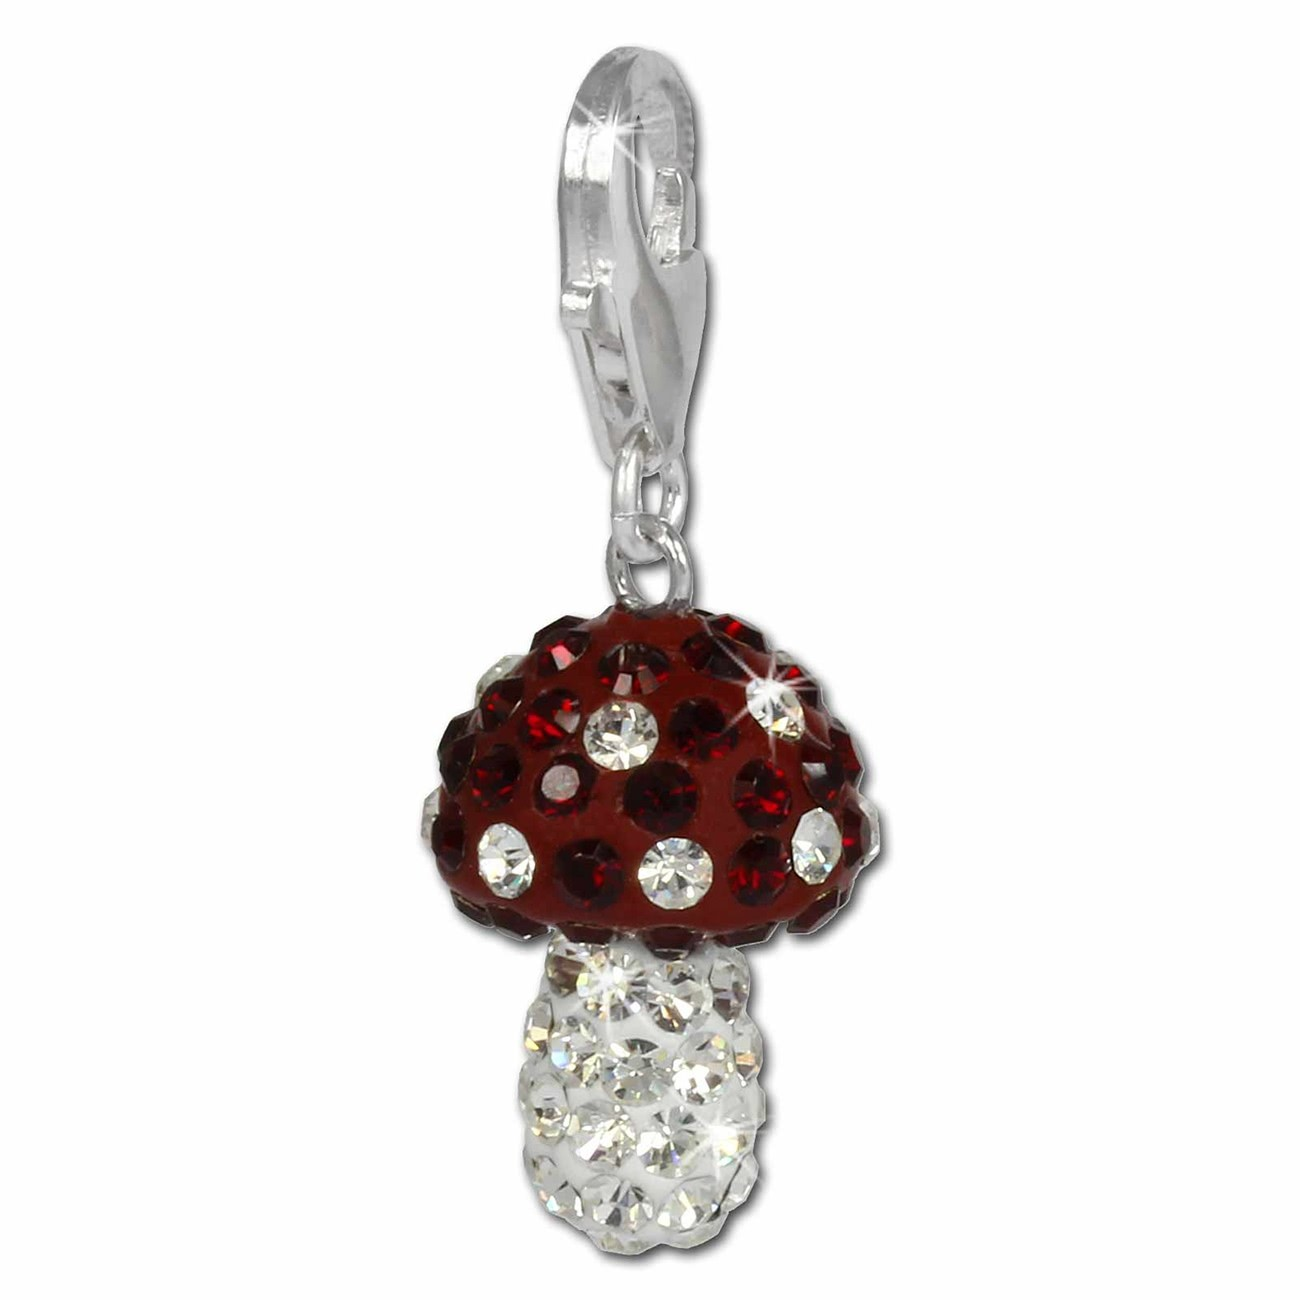 SilberDream Glitzer Charm Pilz rot Zirkonia Kristalle 925 GSC306R